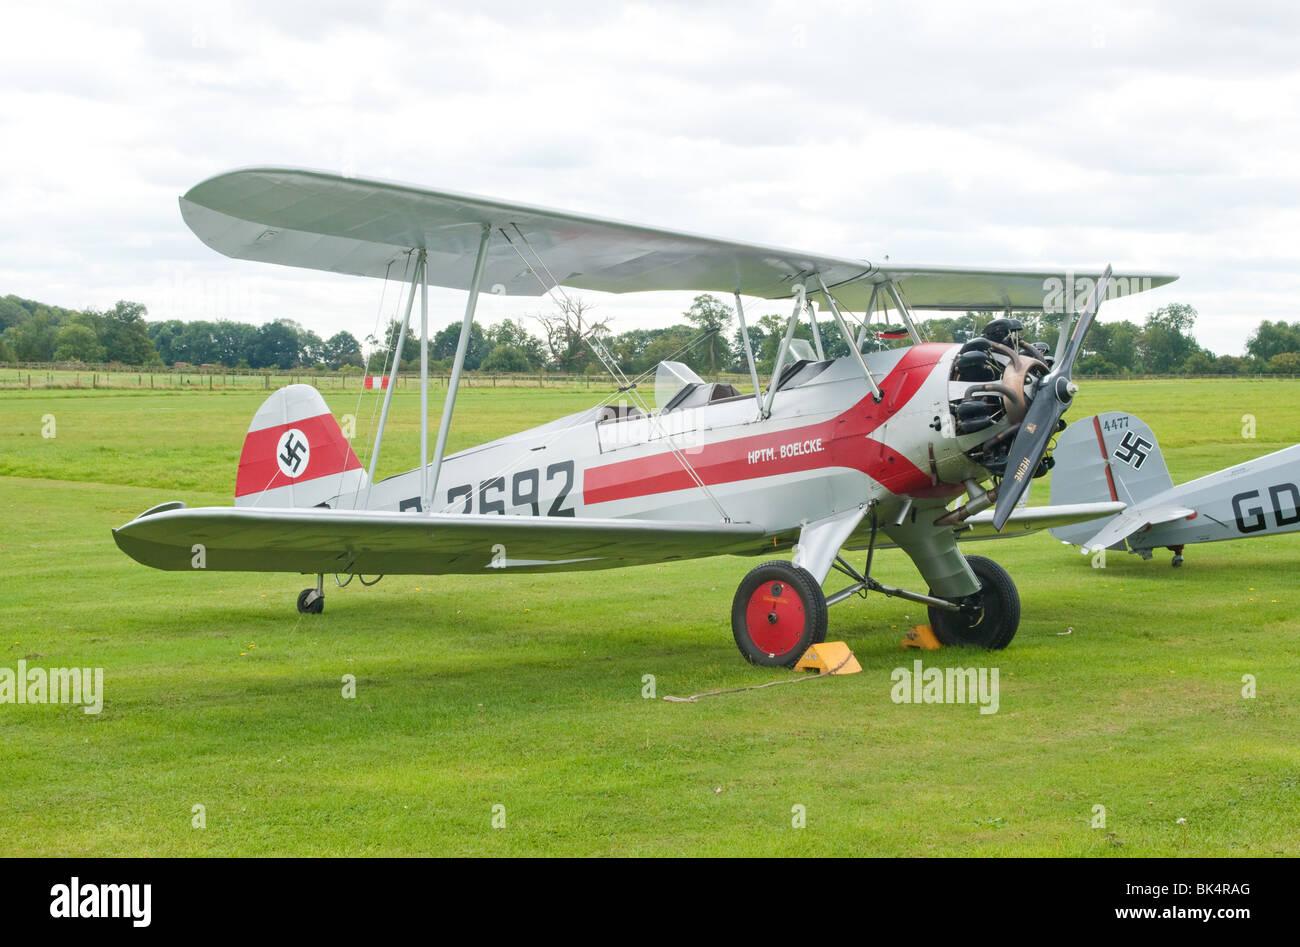 Focke Wulf FW44 Stieglitz wartime German trainer biplane - Stock Image